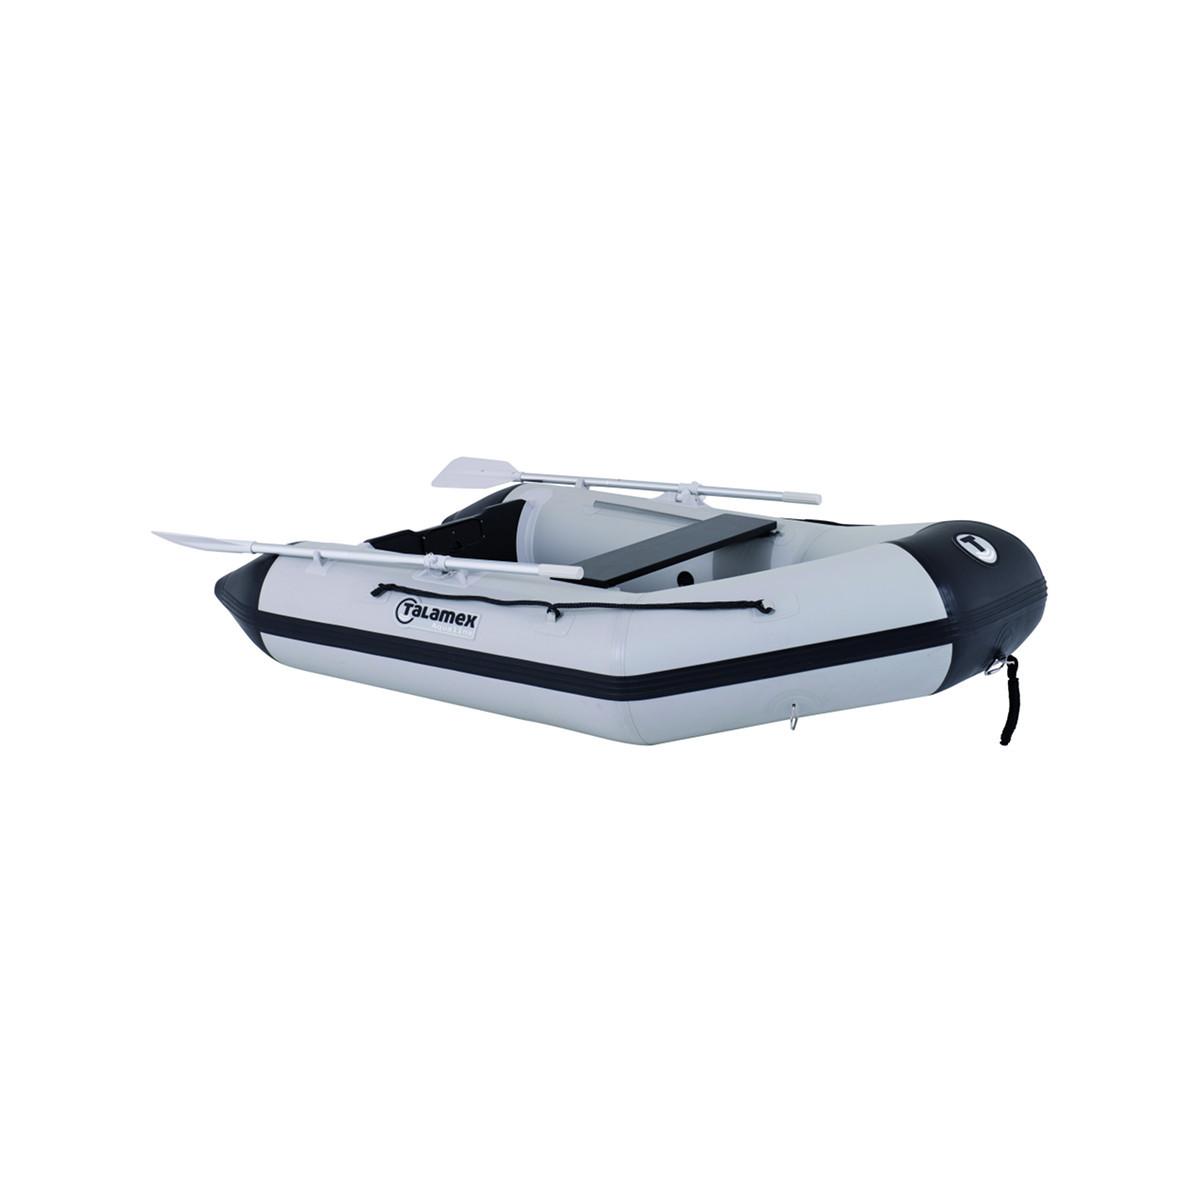 Talamex Aqualine QLA250 opblaasbare rubberboot met opblaasbare bodem, lengte 2,50m, lengte 2,50m, grijs